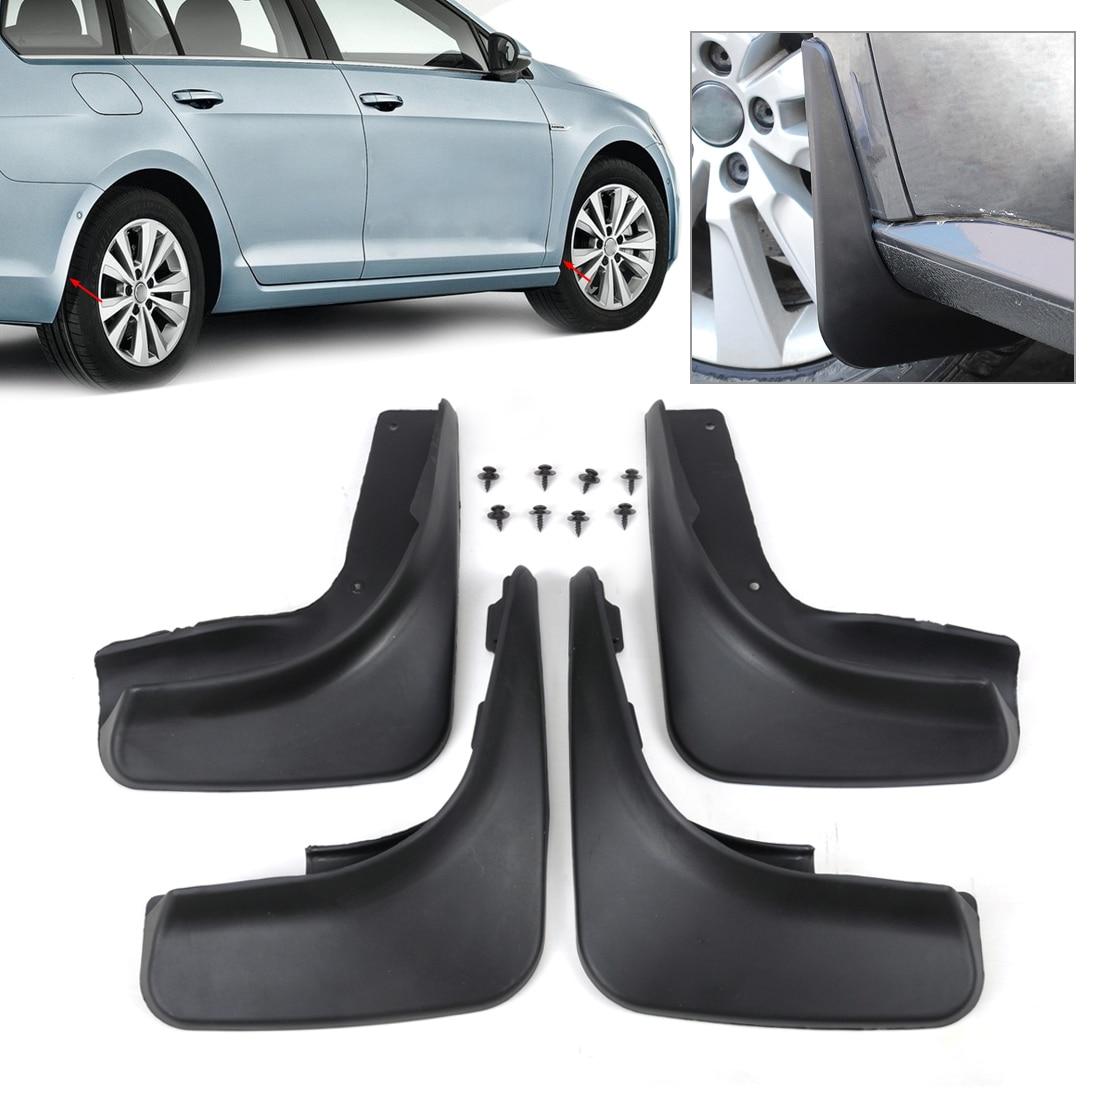 Volkswagen Golf Hatchback Review 2009 2012: CITALL 4Pcs Cool Mud Flap Flaps Splash Guards Mudguard